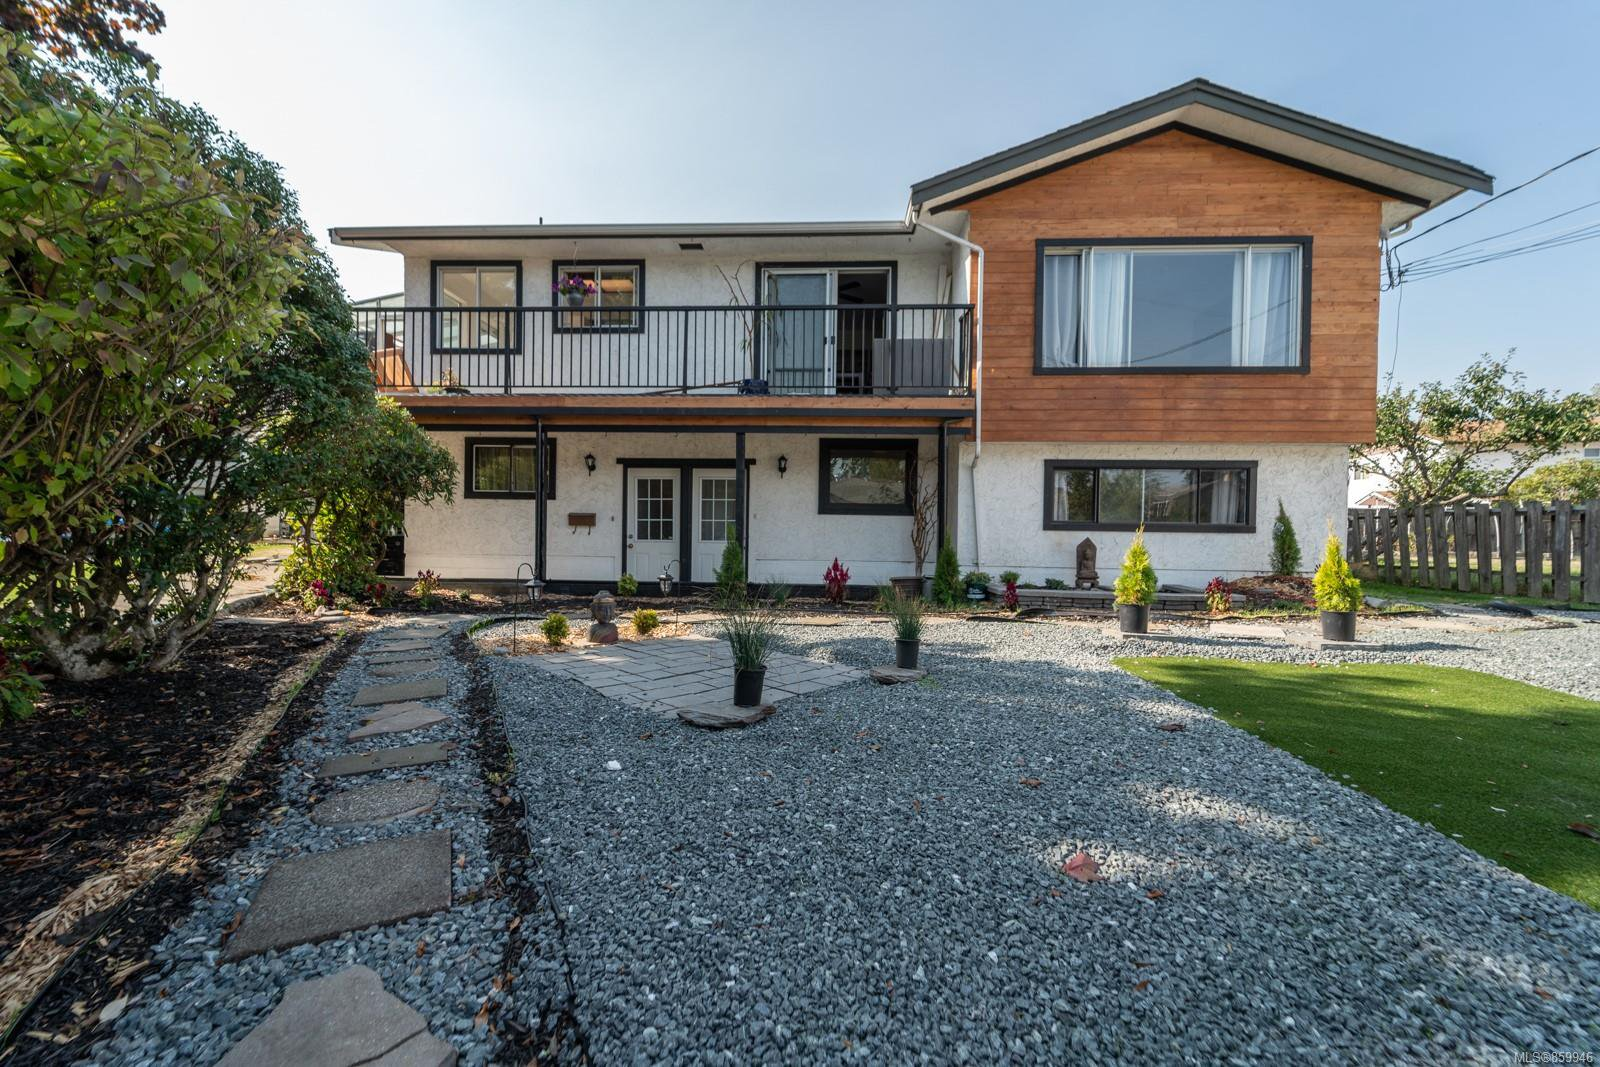 Main Photo: 2743 Raycroft Pl in : La Langford Proper House for sale (Langford)  : MLS®# 859946